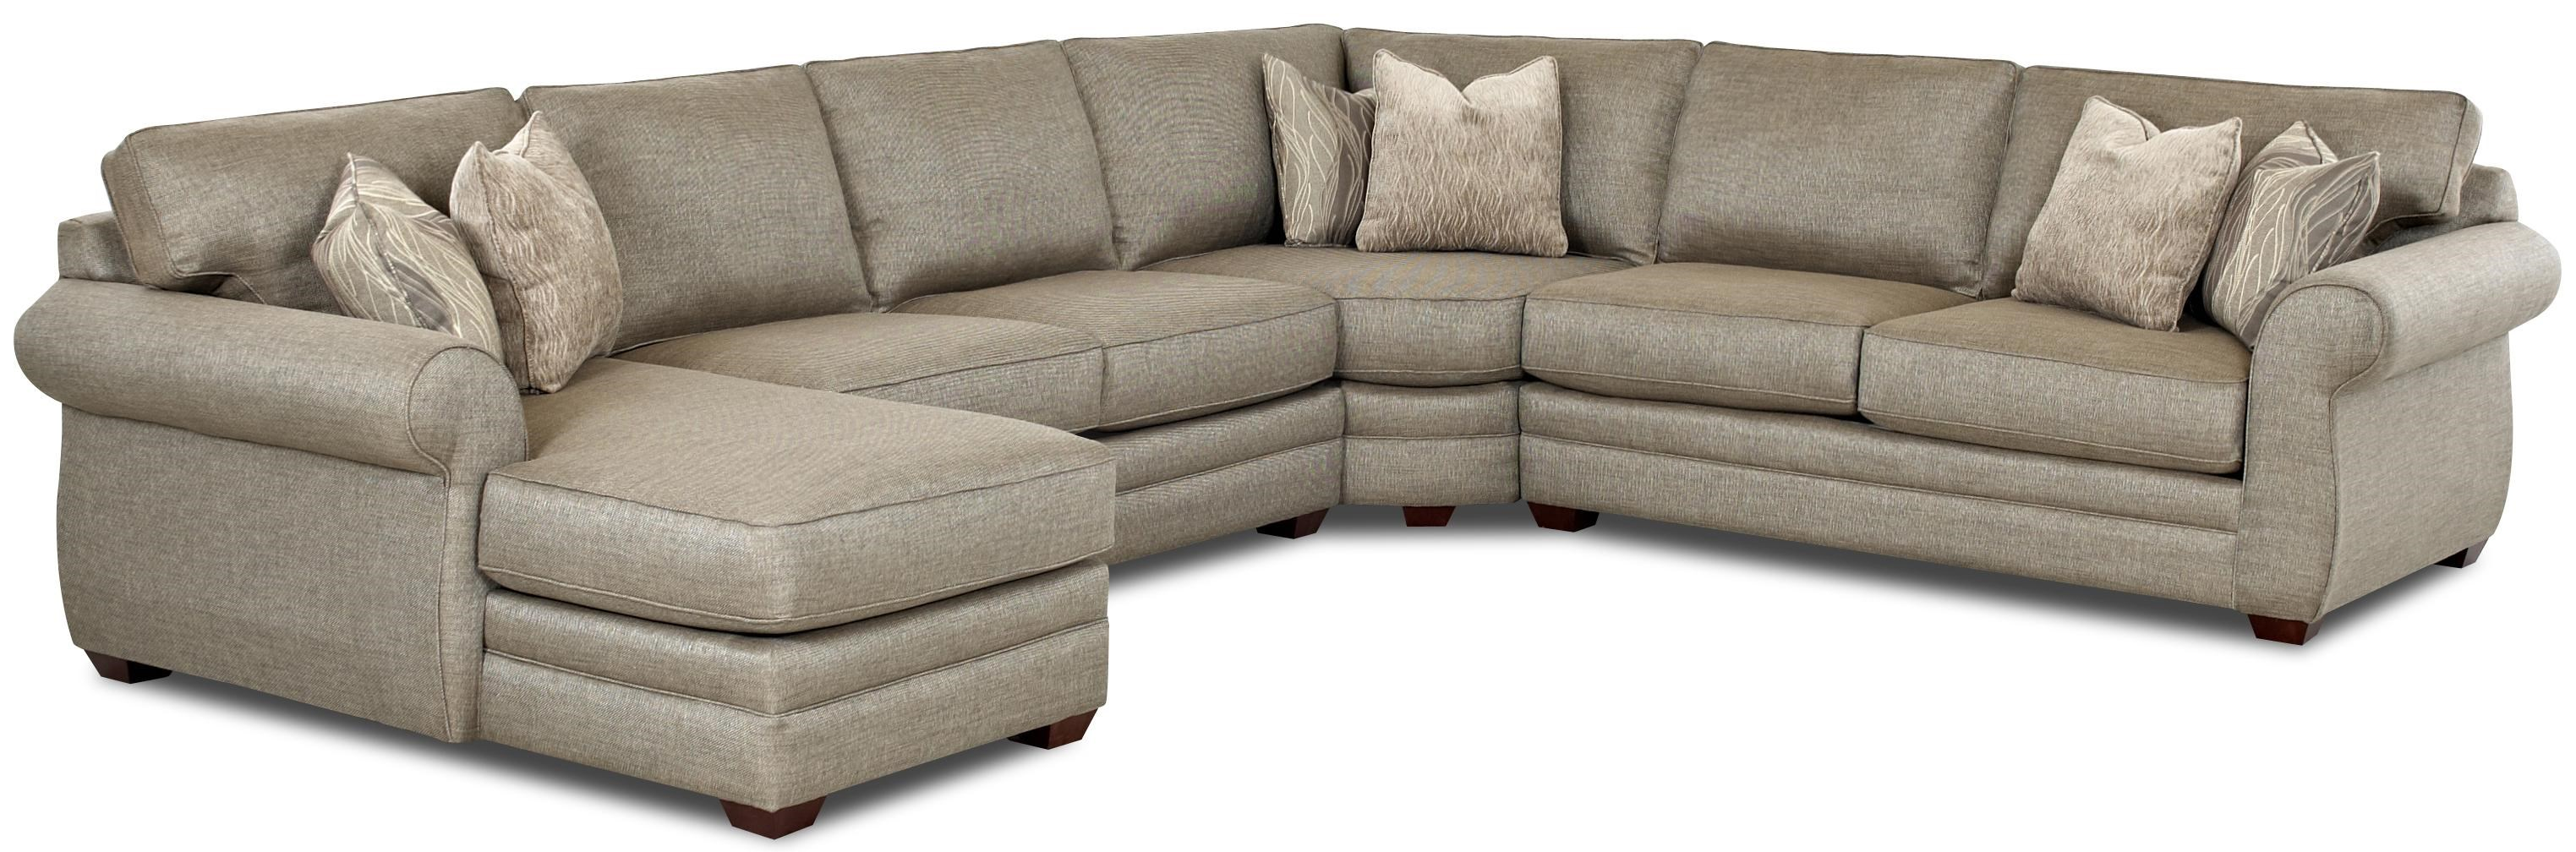 hudson s furniture